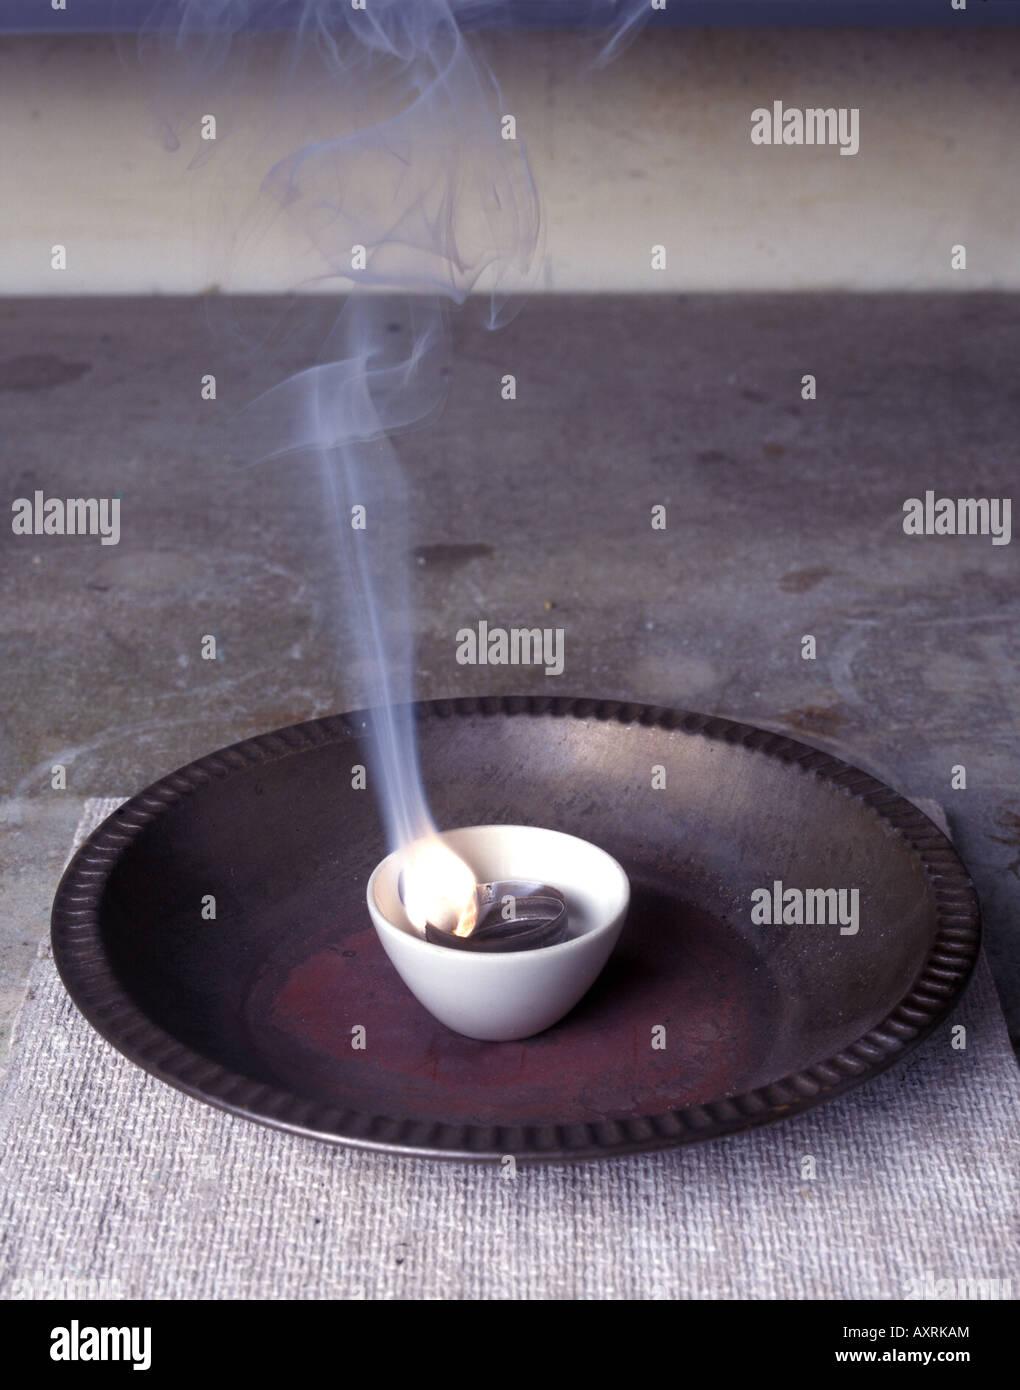 Ruban de magnésium brûle dans un creuset Photo Stock